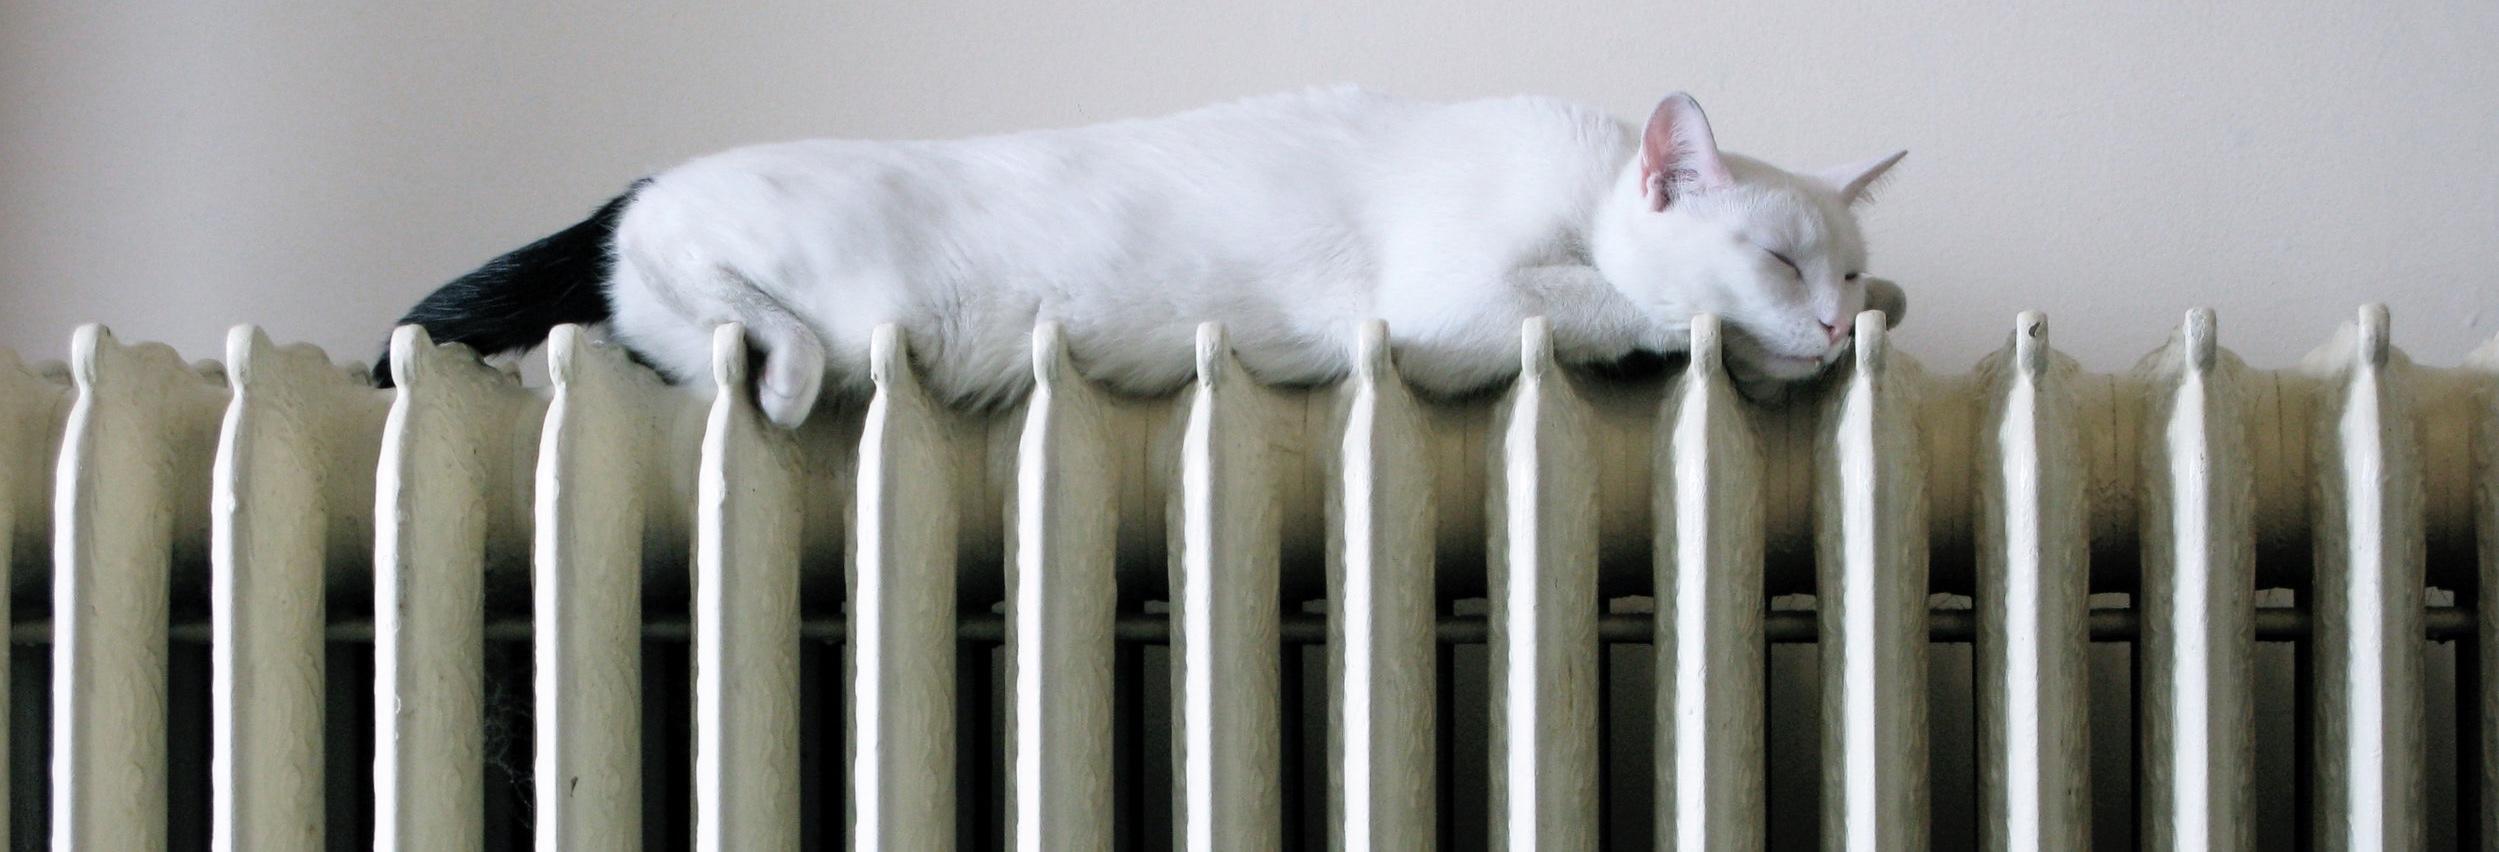 Radiator_with_cat_plumbing_heating_bracknell_power_flush.jpg